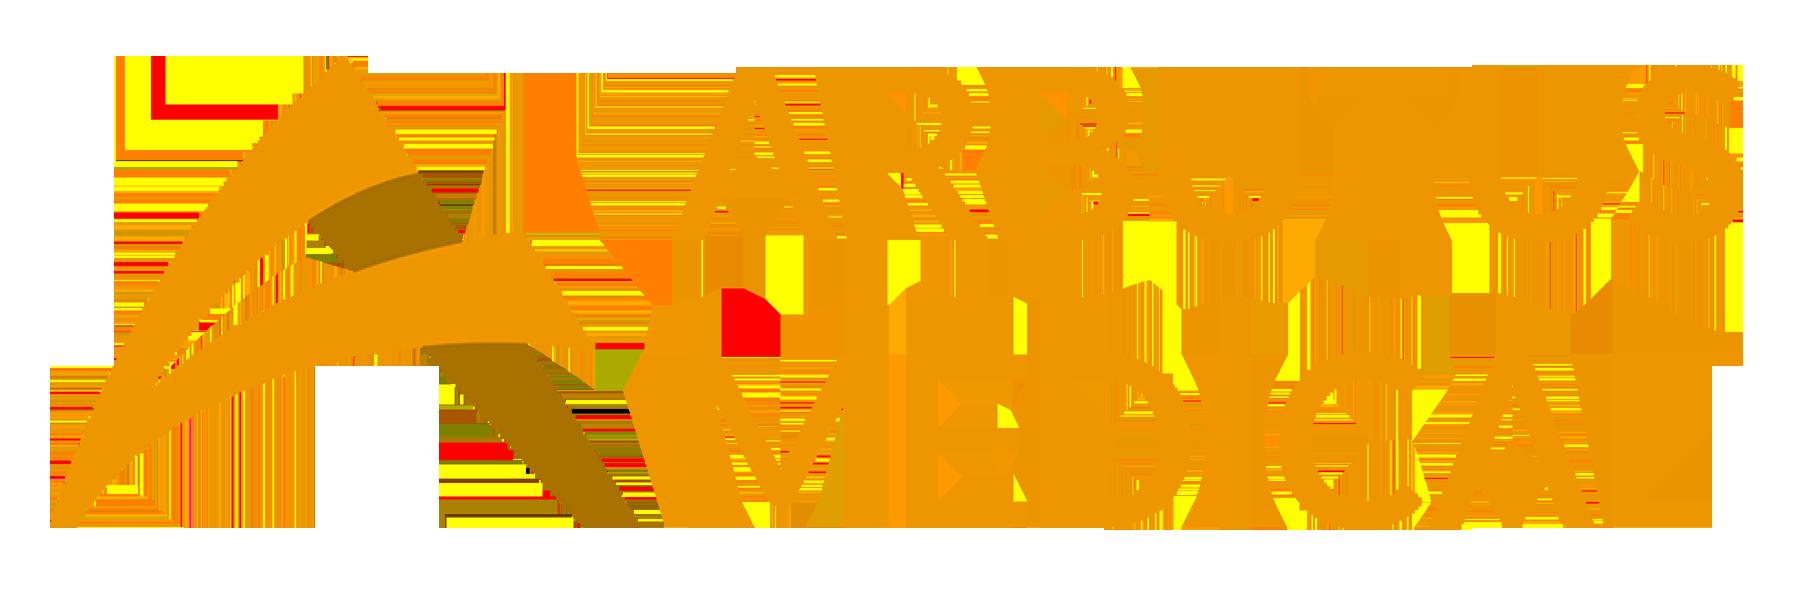 arbutusmedical.png